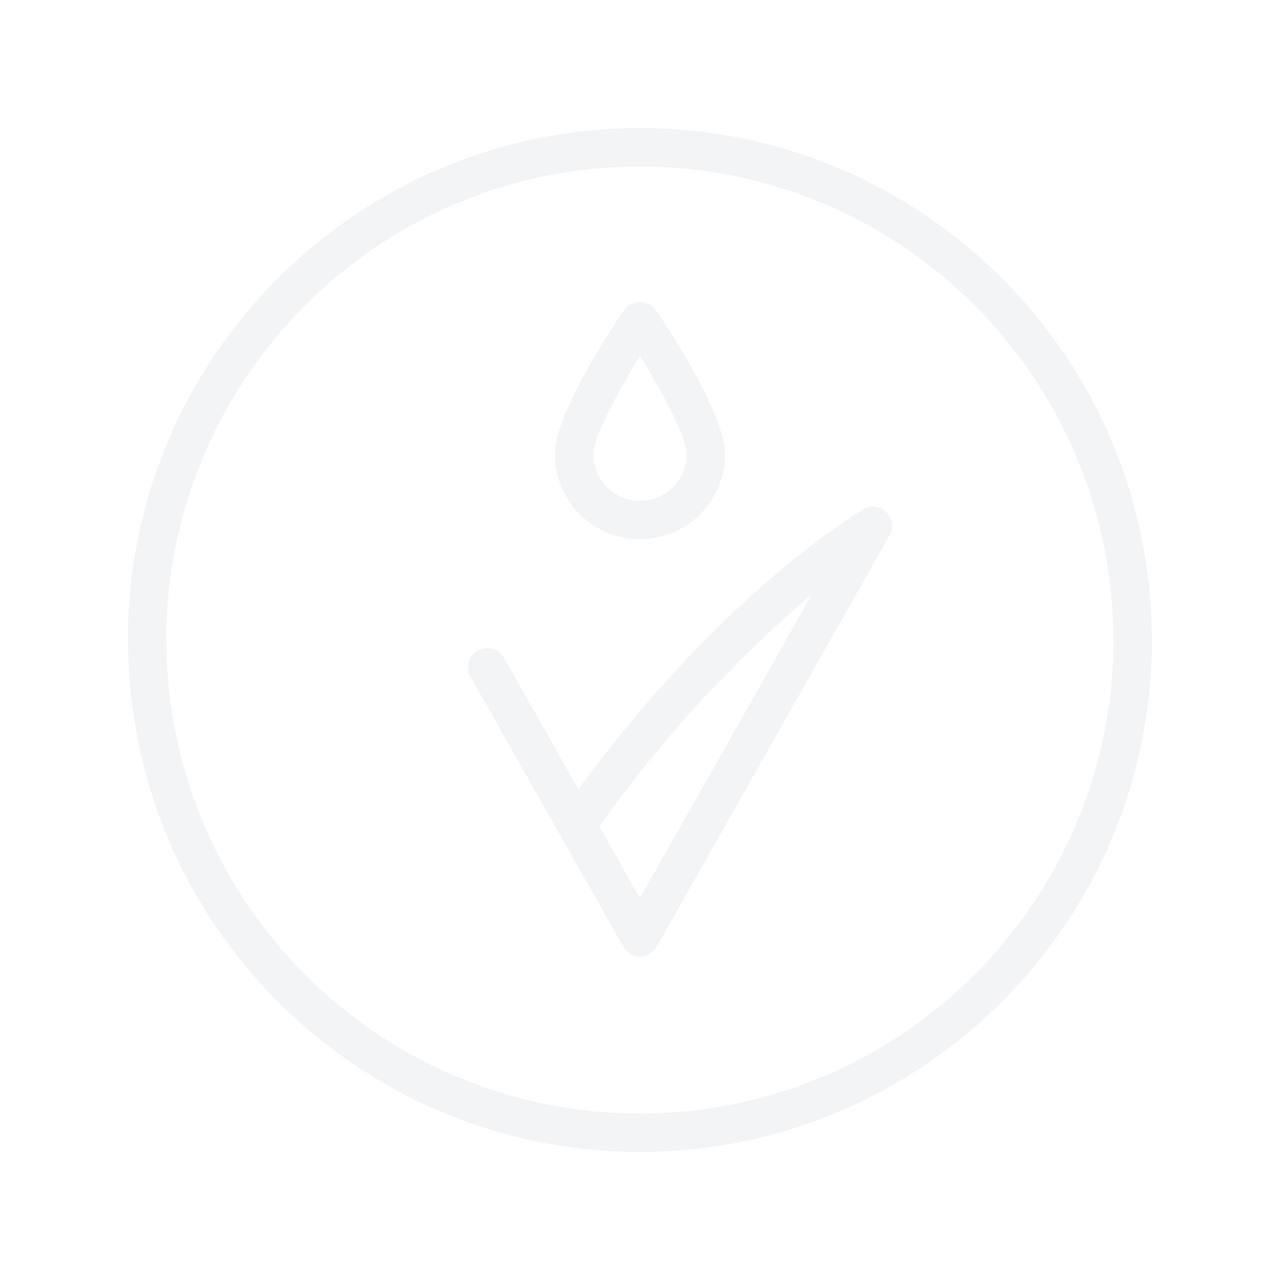 MIZON Joyful Time Essence Aloe Mask 23g тканевая маска для лица